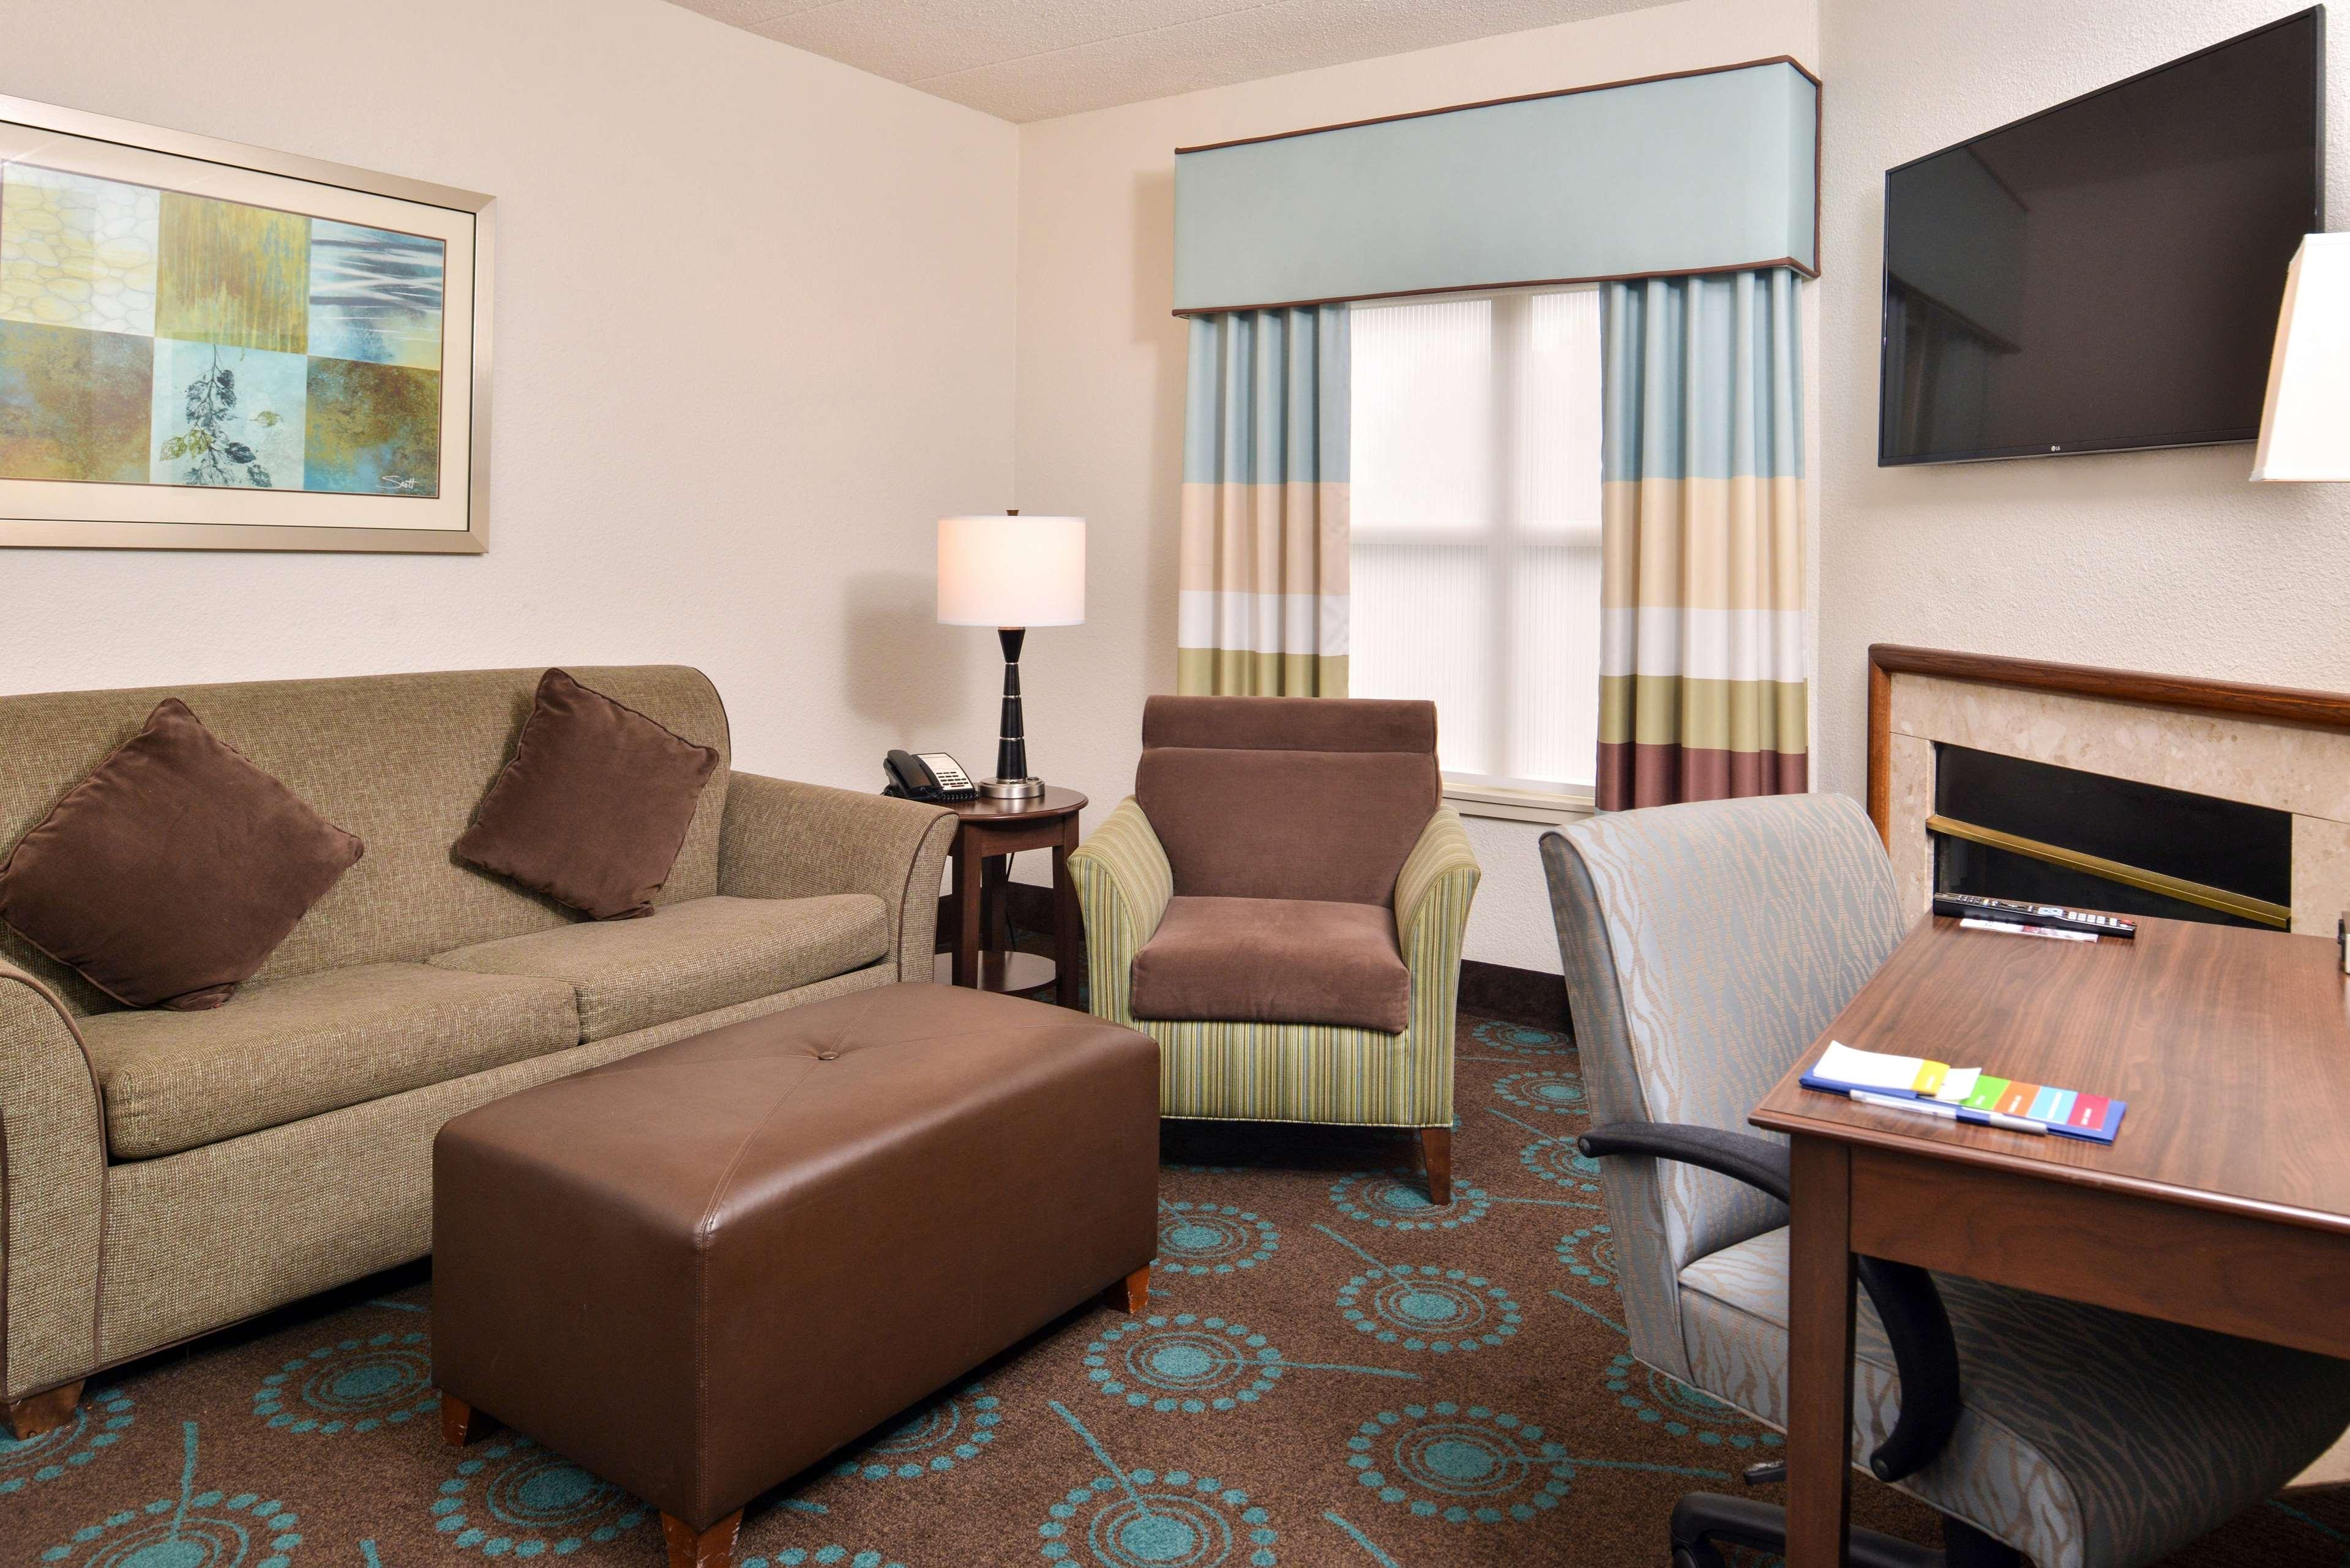 Hampton Inn & Suites Newport News (Oyster Point) image 22